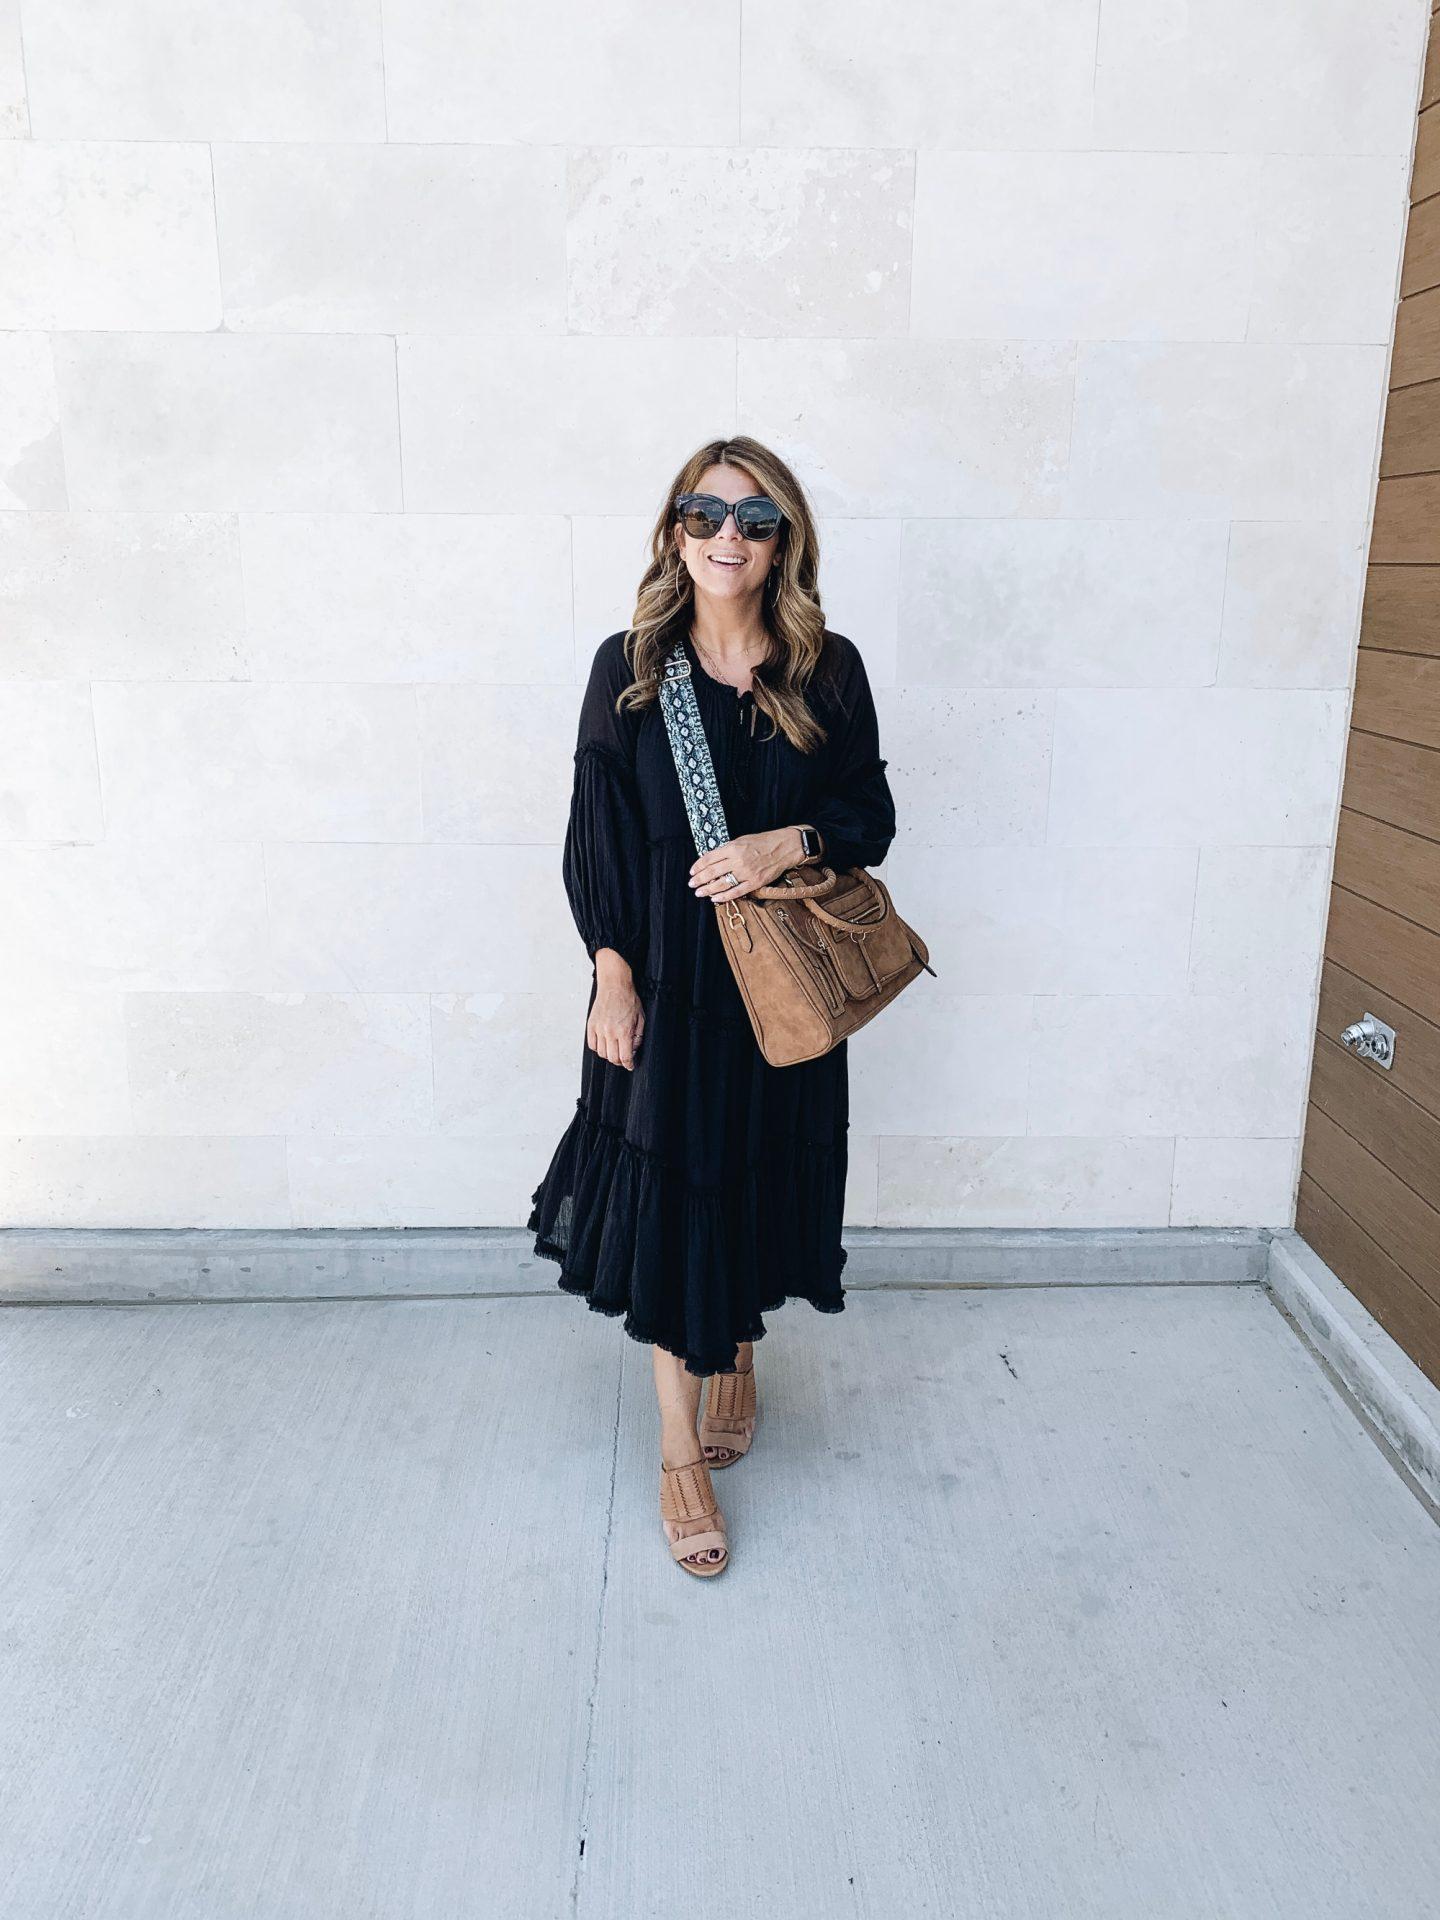 Target, Bag Strap, Boho Style, Boho Dress, Emerson Charles, #Shopemersoncharles, #emersoncharles